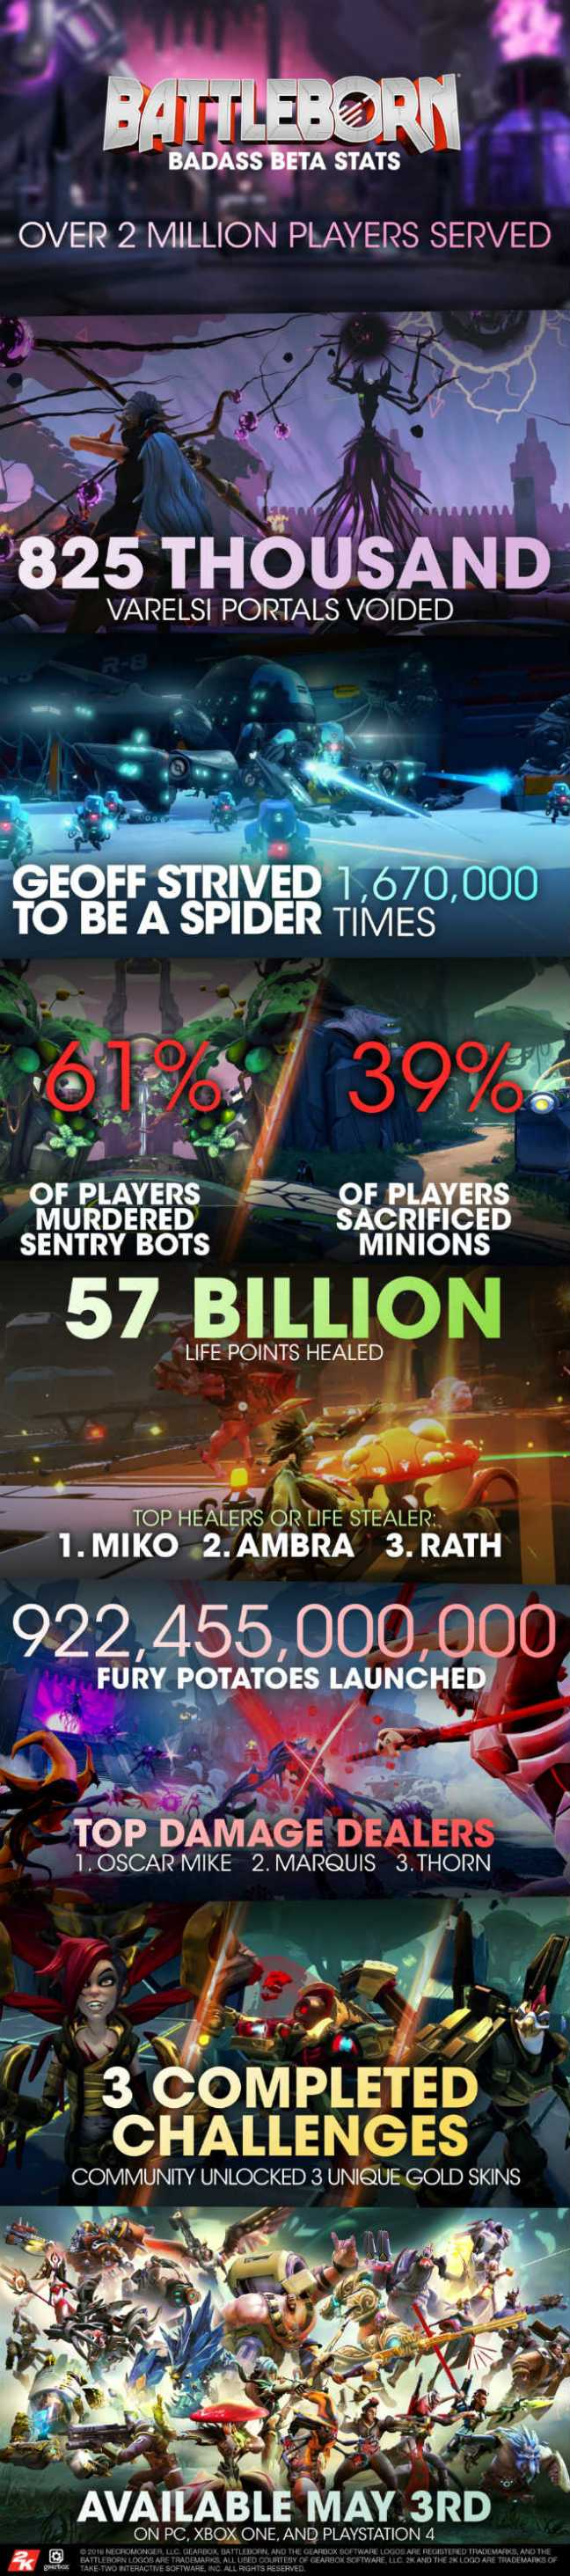 battleborn statistik